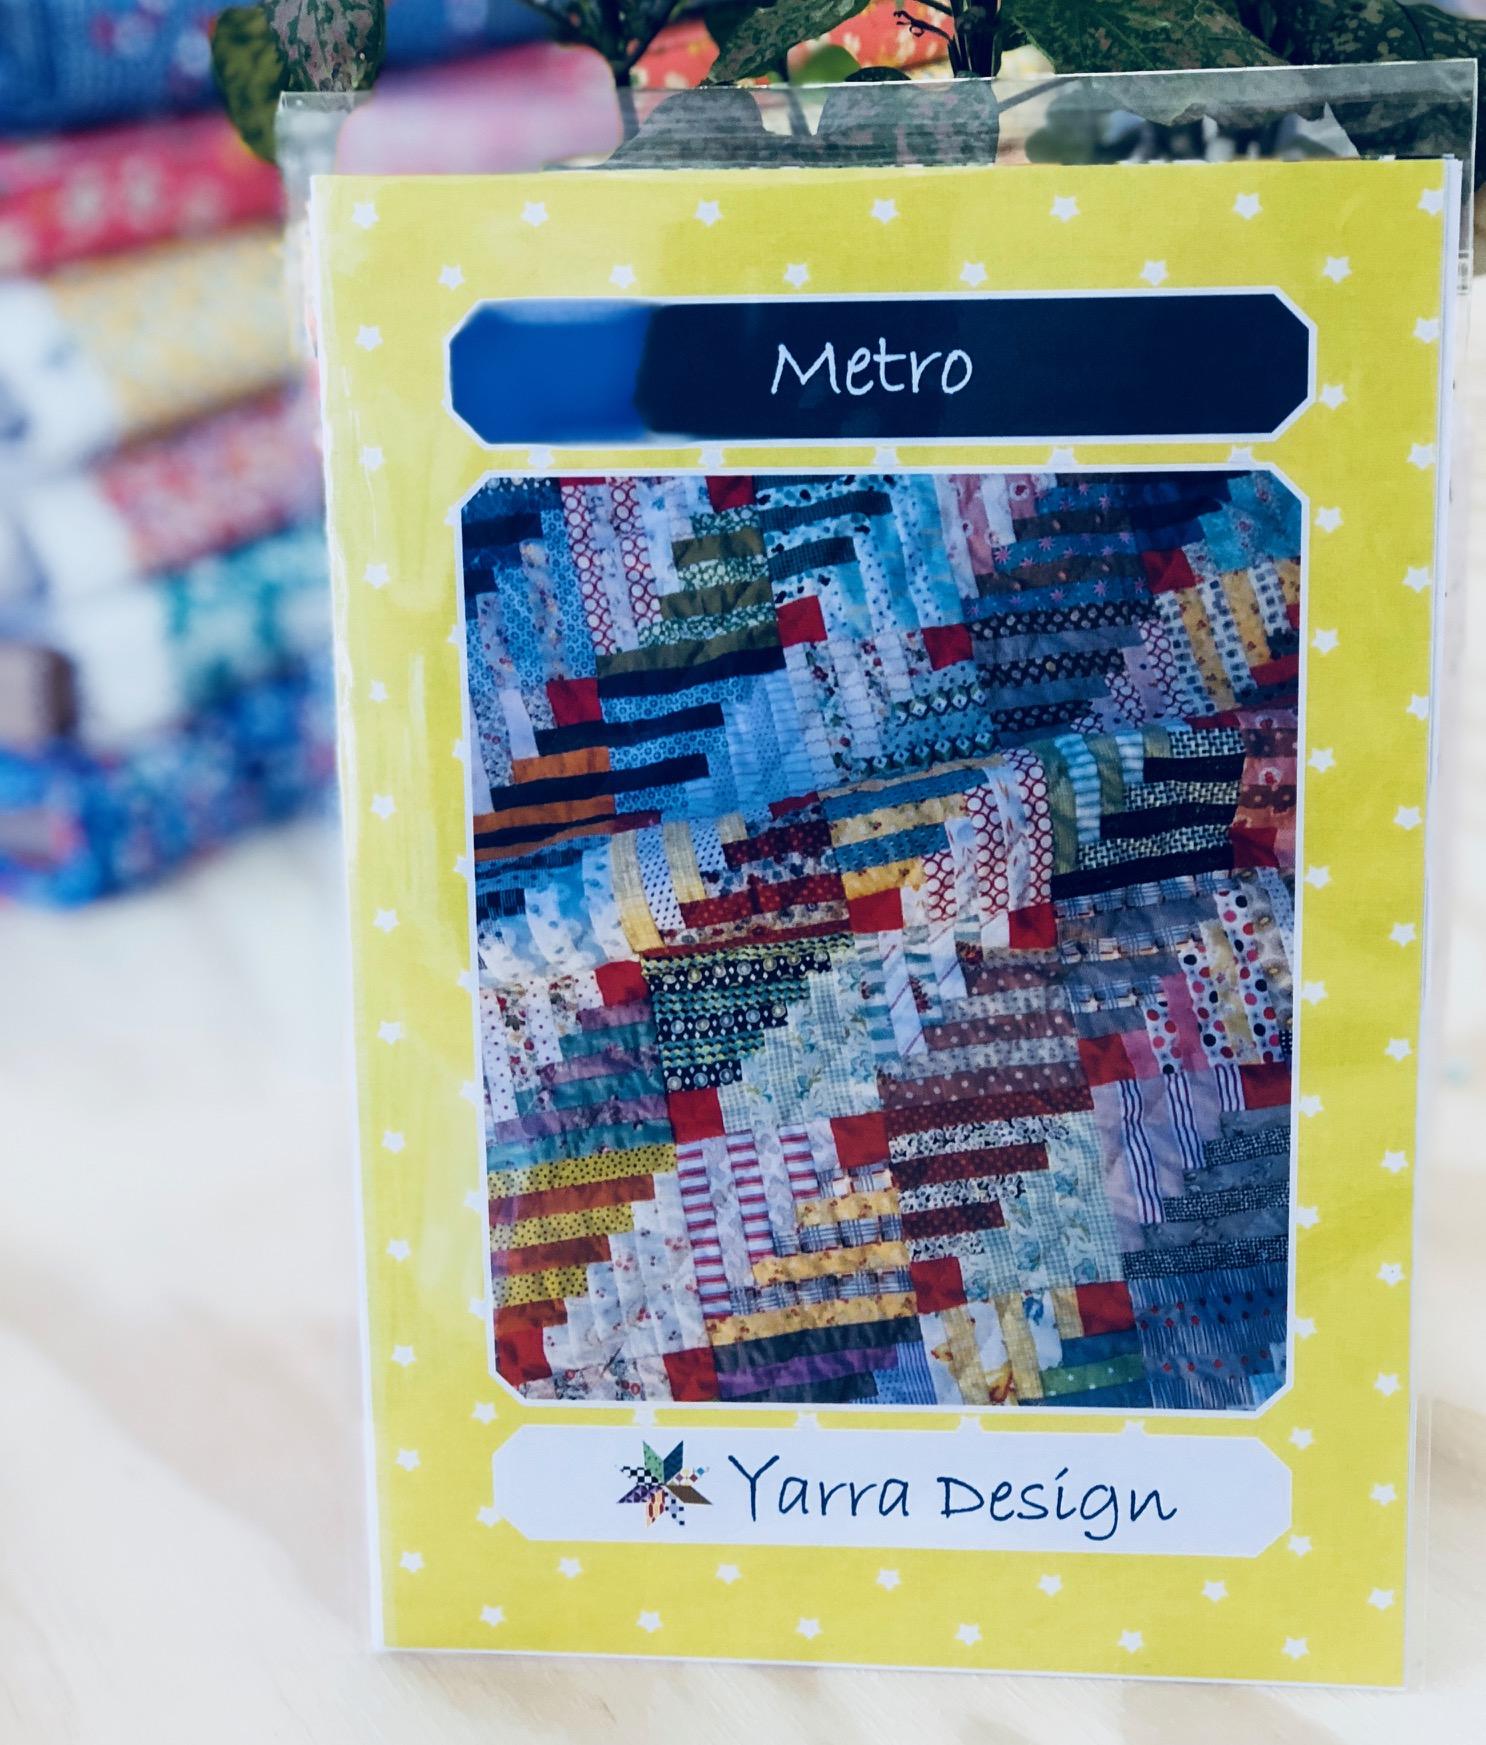 Yarra Design - Metro